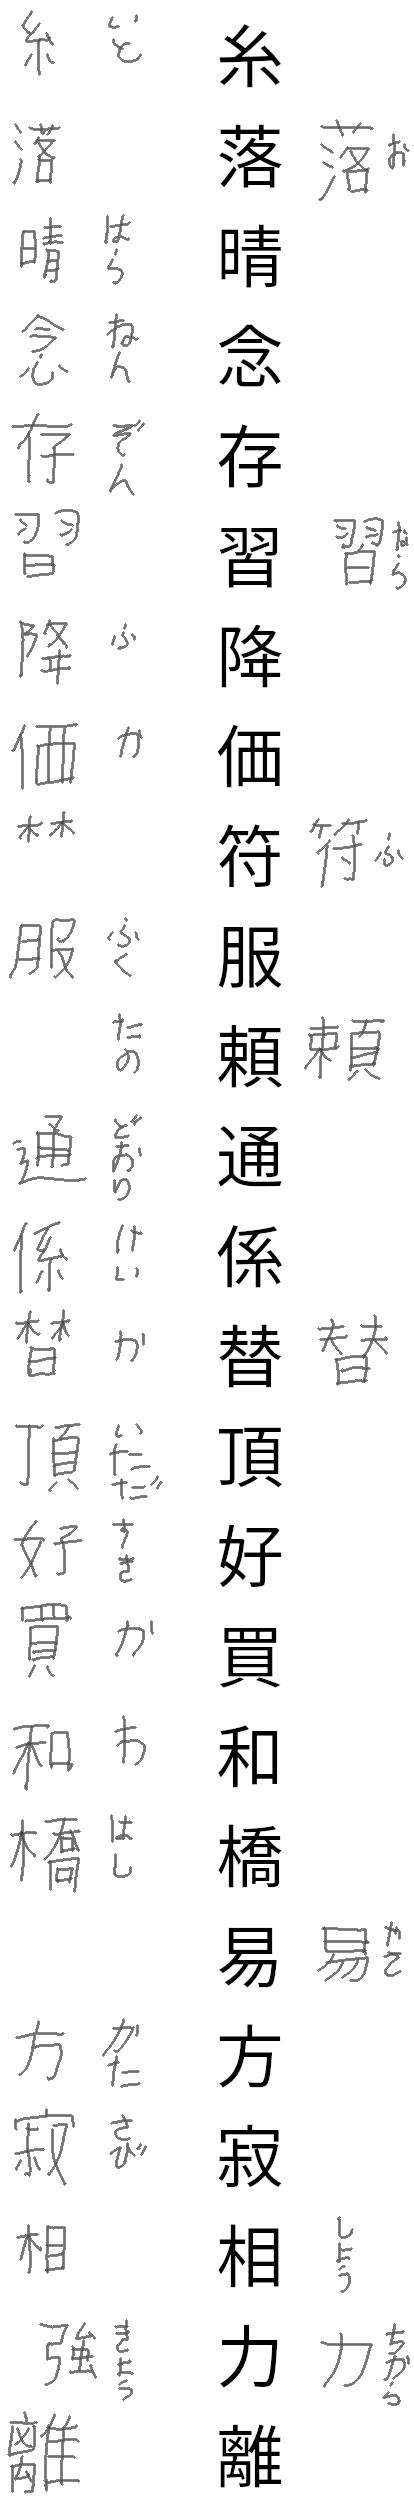 kanji test repeat row 1